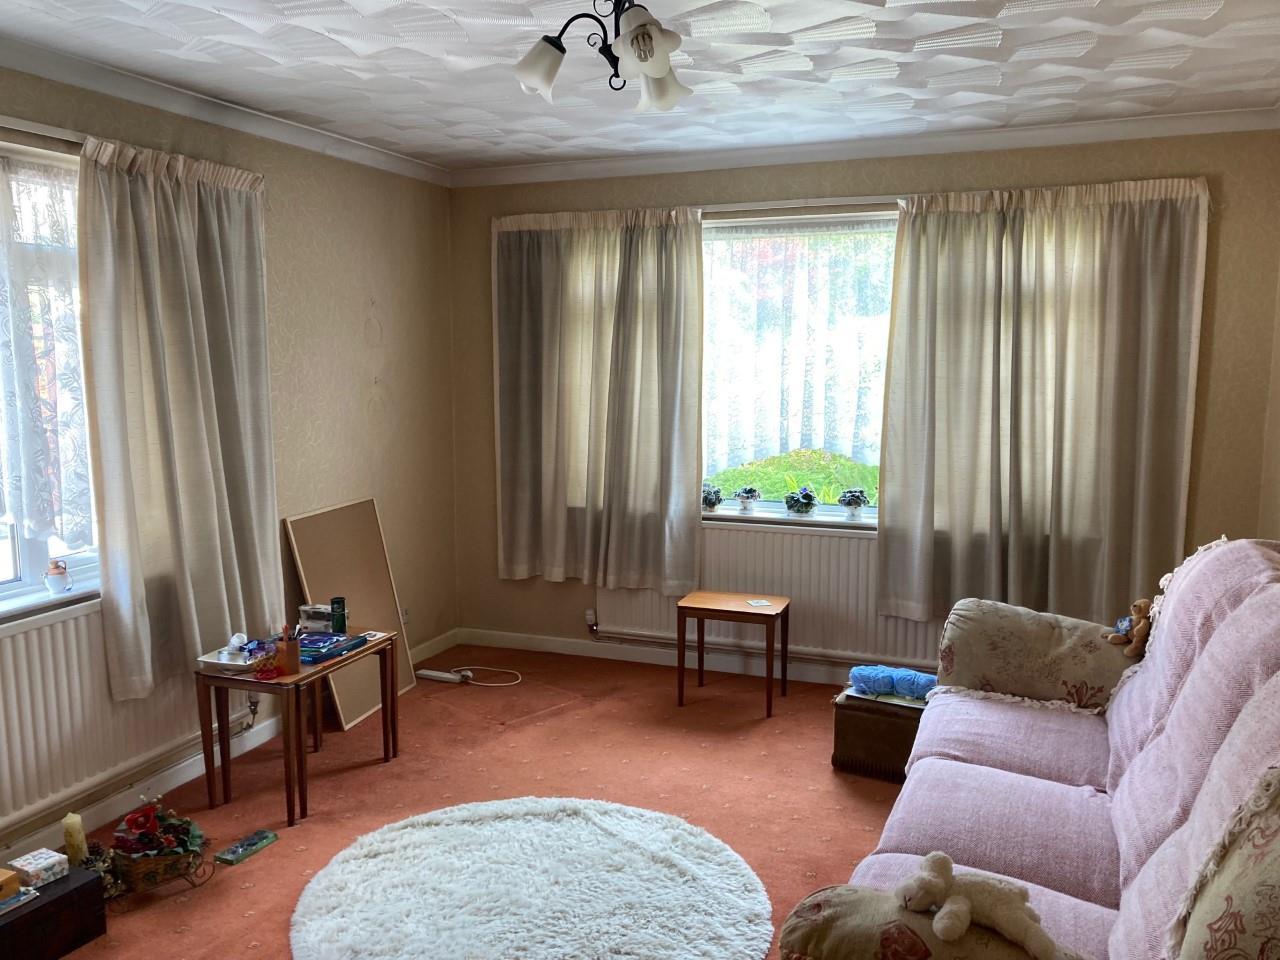 Gelli Gwyn Road, Morriston, Swansea, SA6 7PP